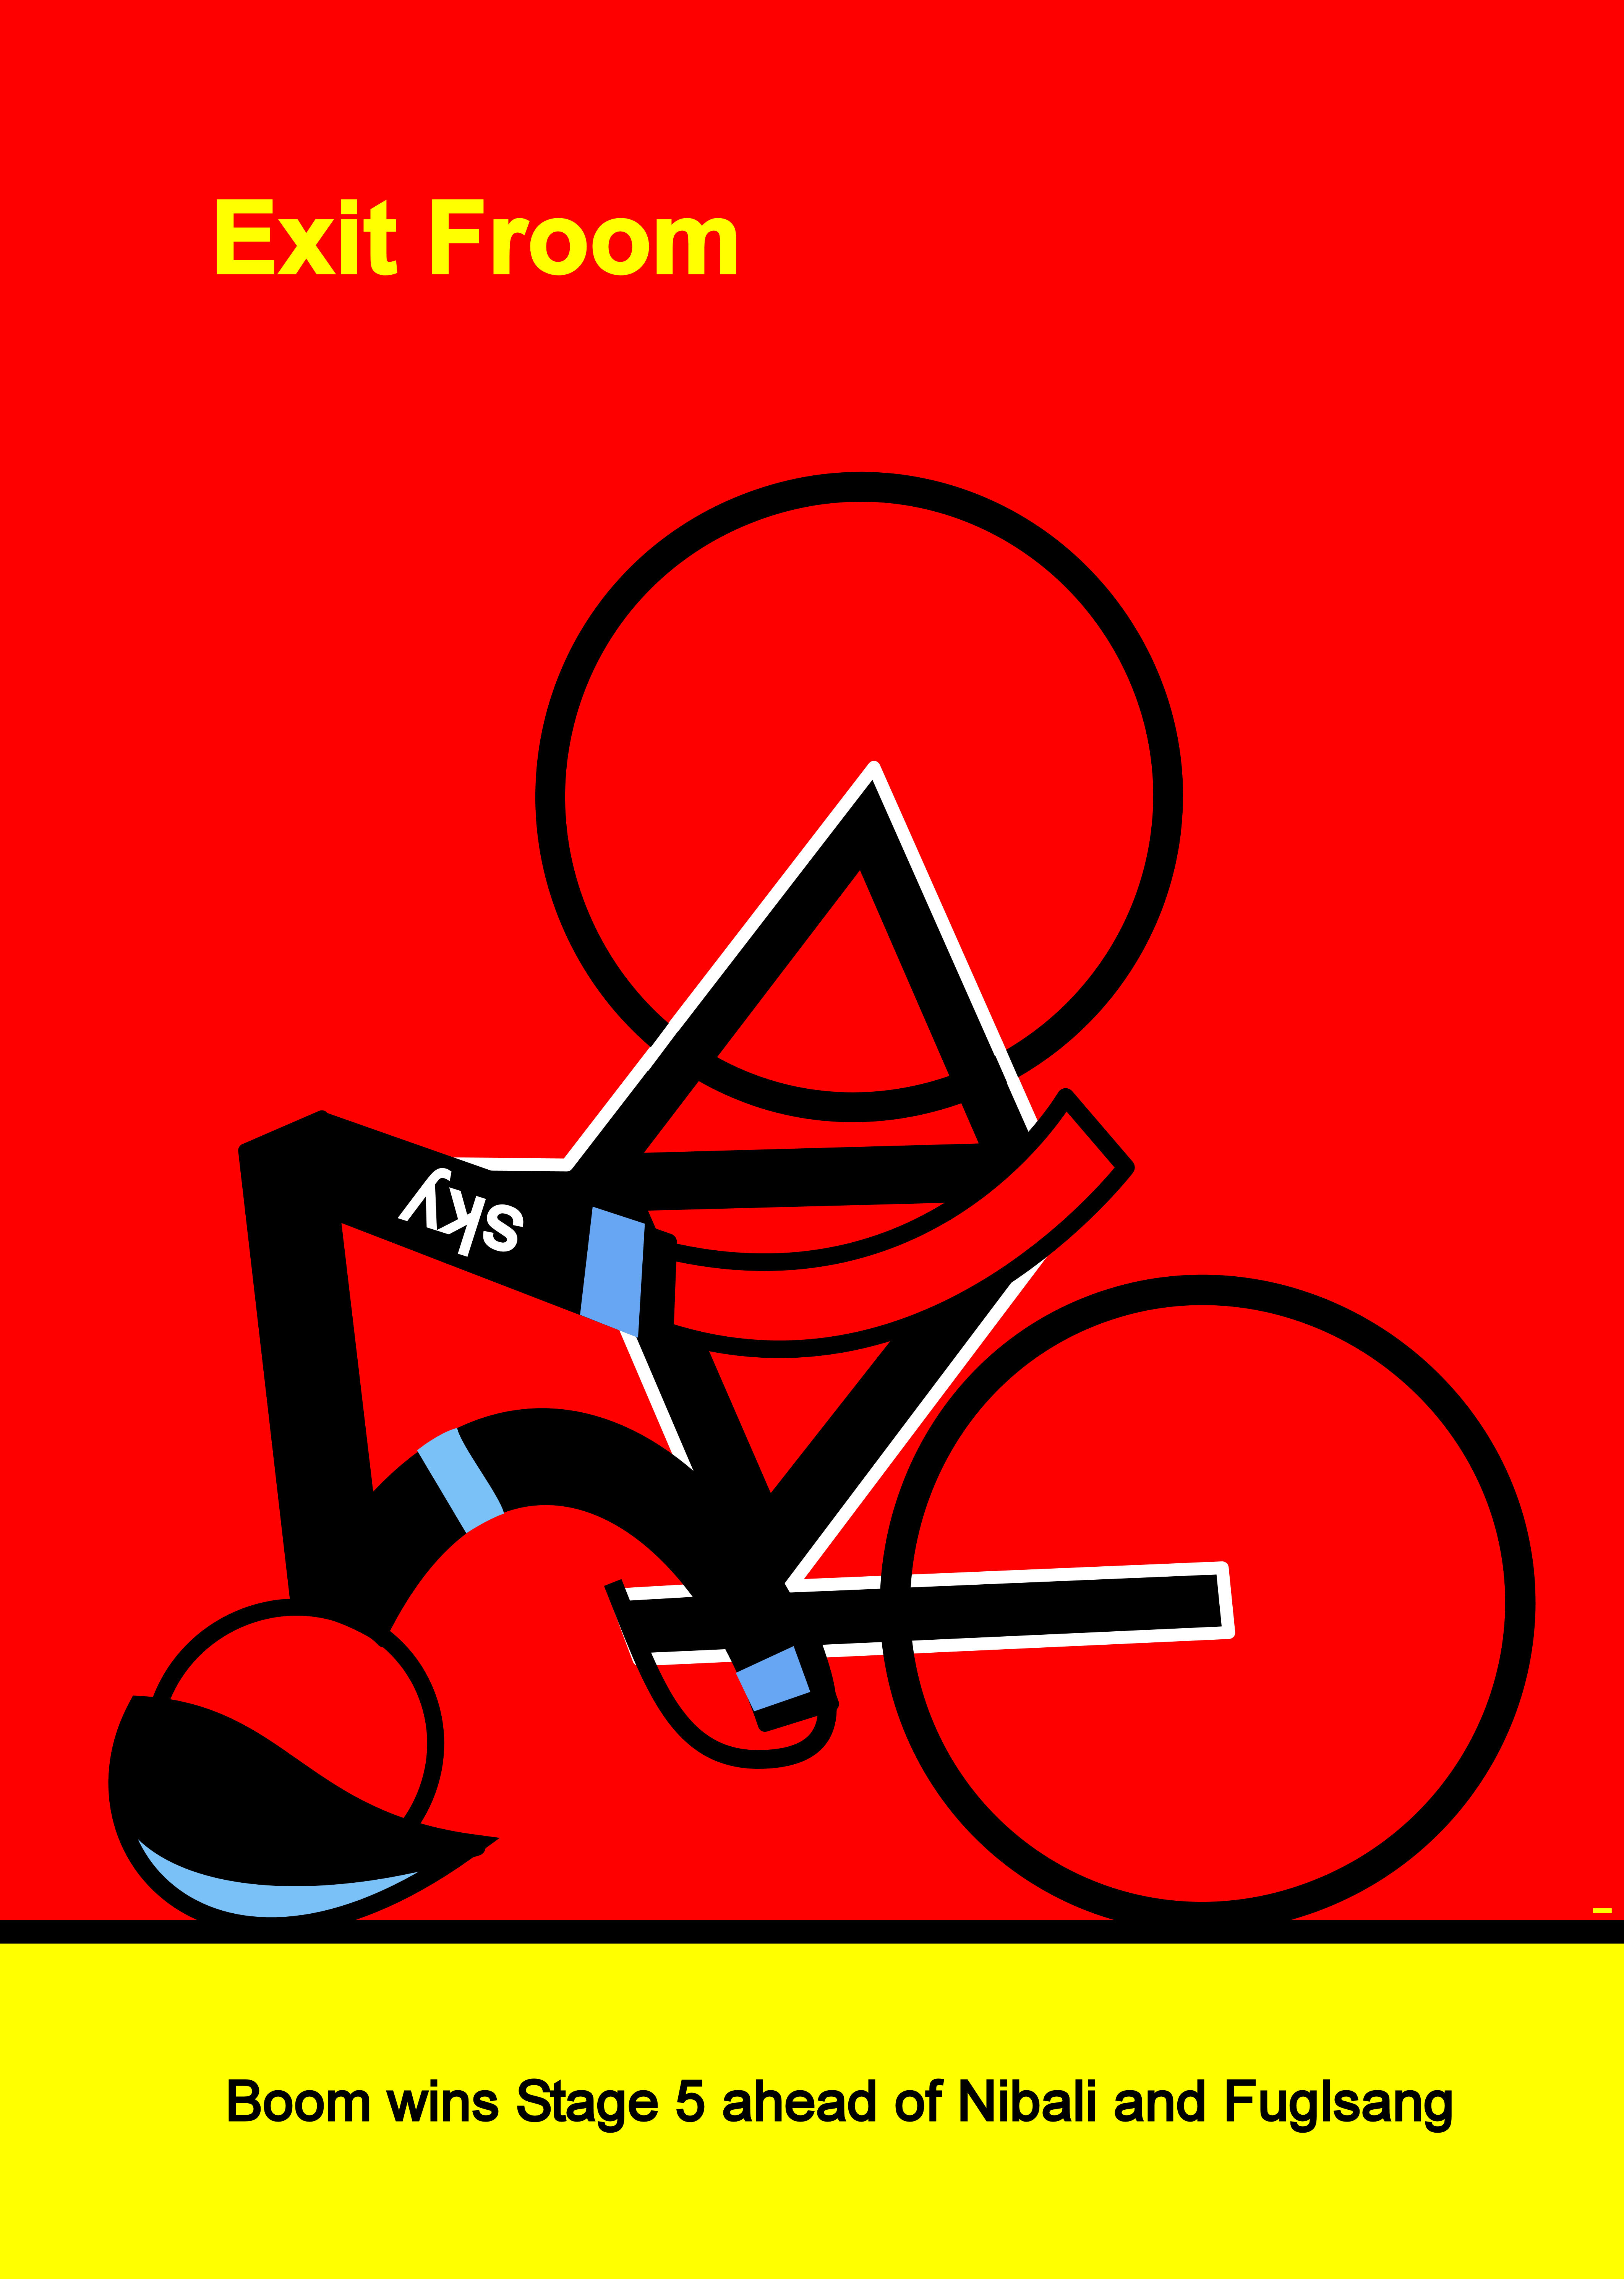 Ypres, Arenberg Porte du                                         Hainaut, Exit Froom, Froom,                                         Boom, Stage 5, July 9th, Nibali,                                         Tour de France 2014, Tour de                                         France, Ypres, Arenberg Porte du                                         Hainaut, sortie Froom, Froom,                                         Boom, l'étape 5, le 9 Juillet,                                         Nibali, Tour de France 2014,                                         Tour de France